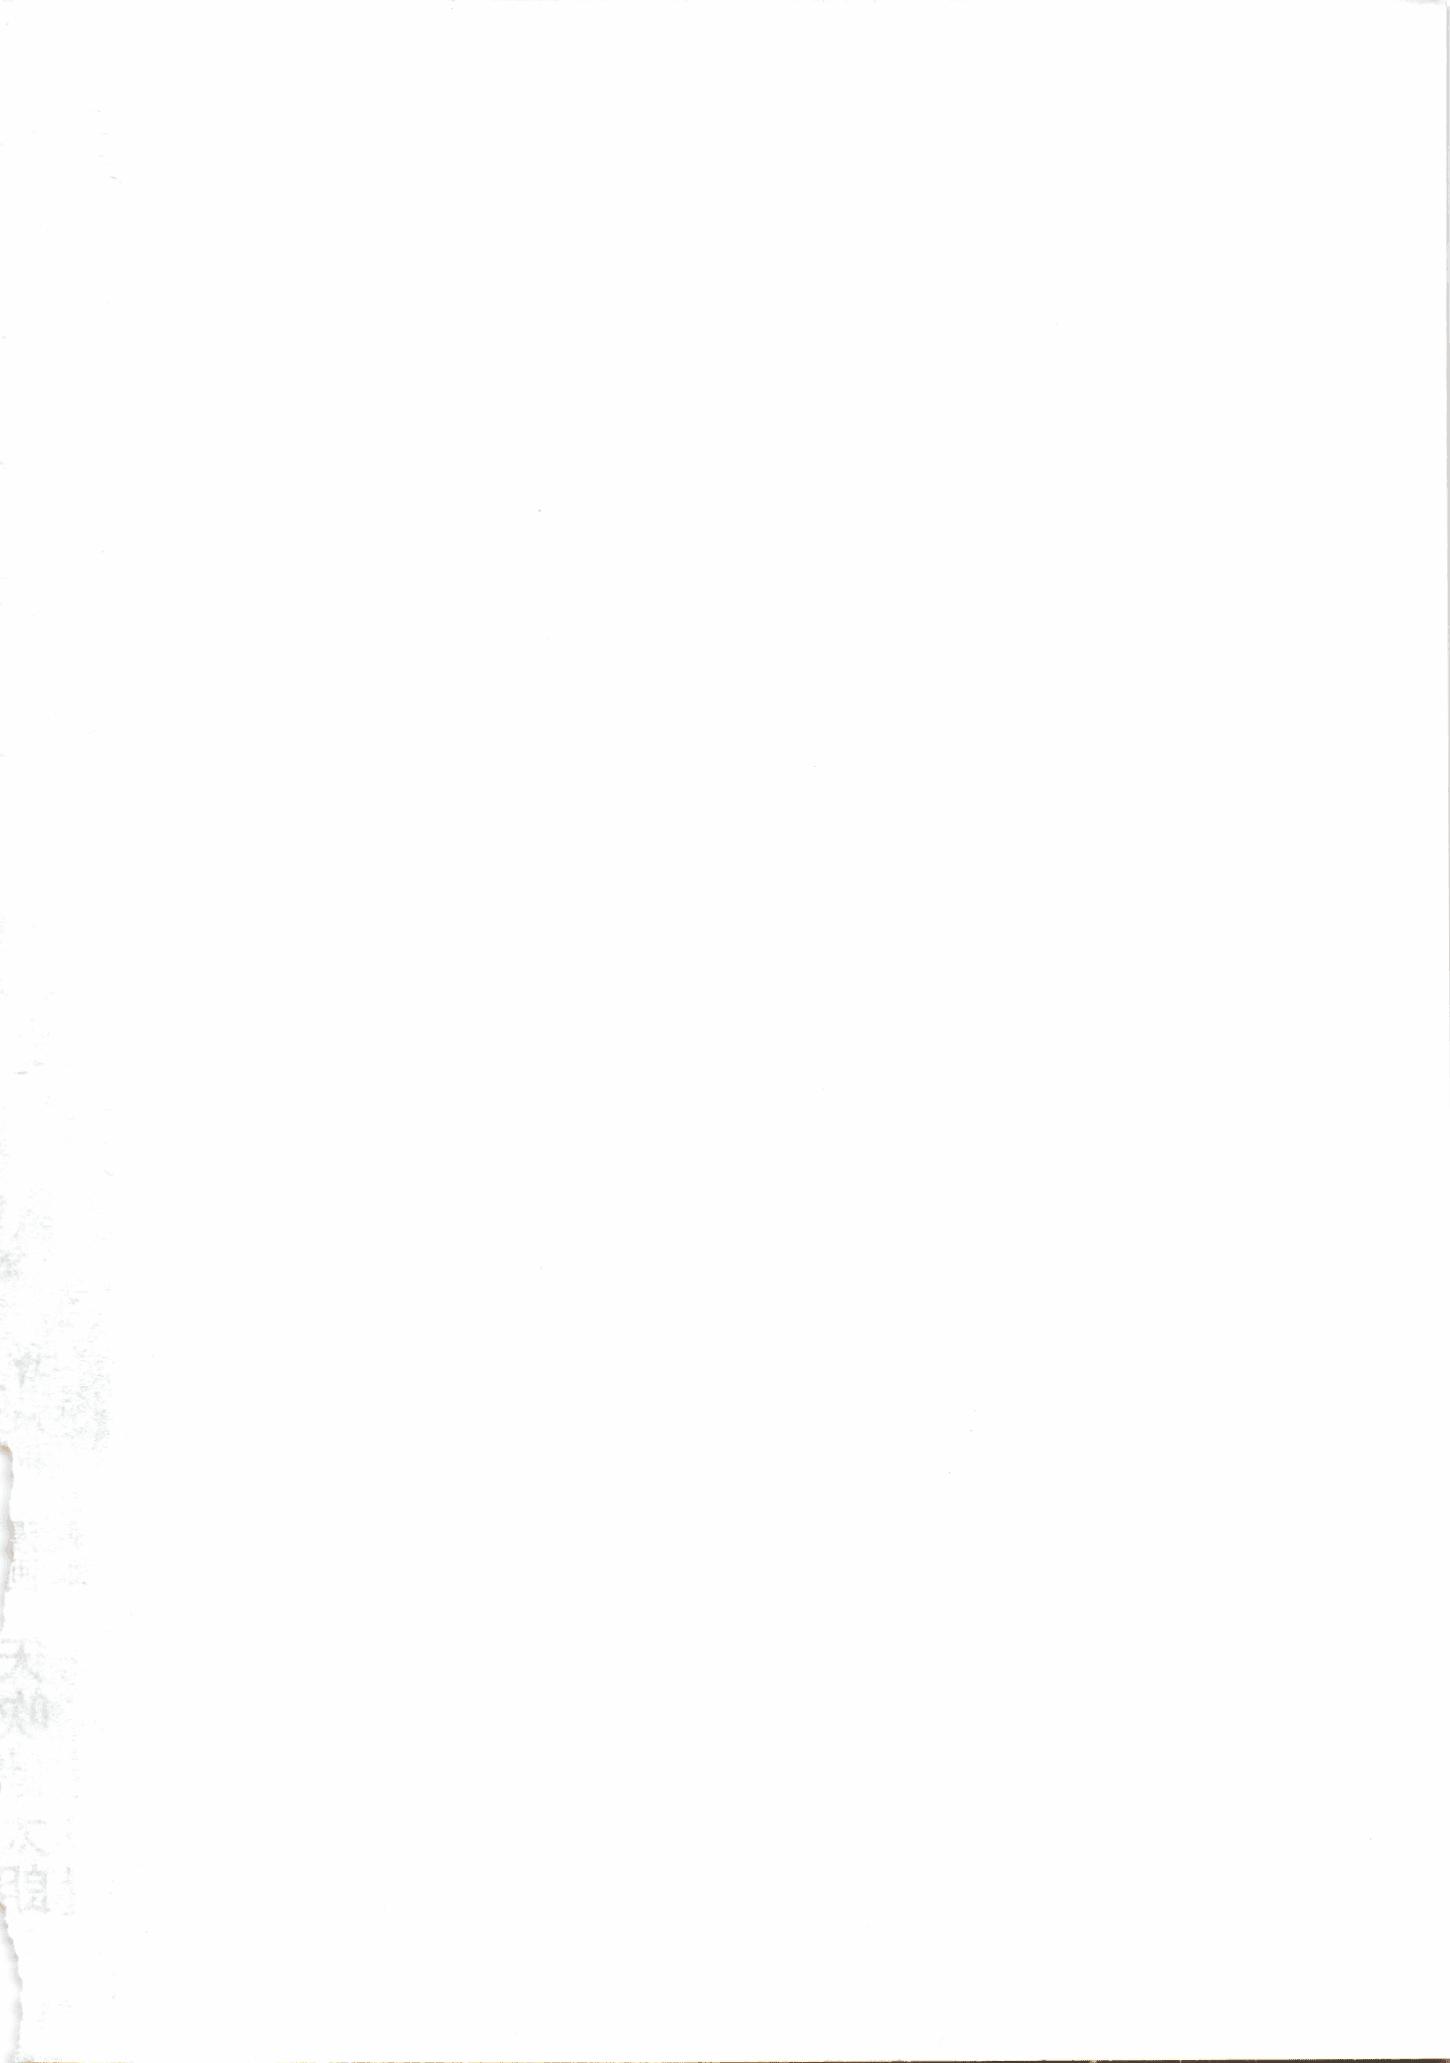 Манга Любовные неприятности / To Love-Ru  - Том 17 Глава 143 Страница 4